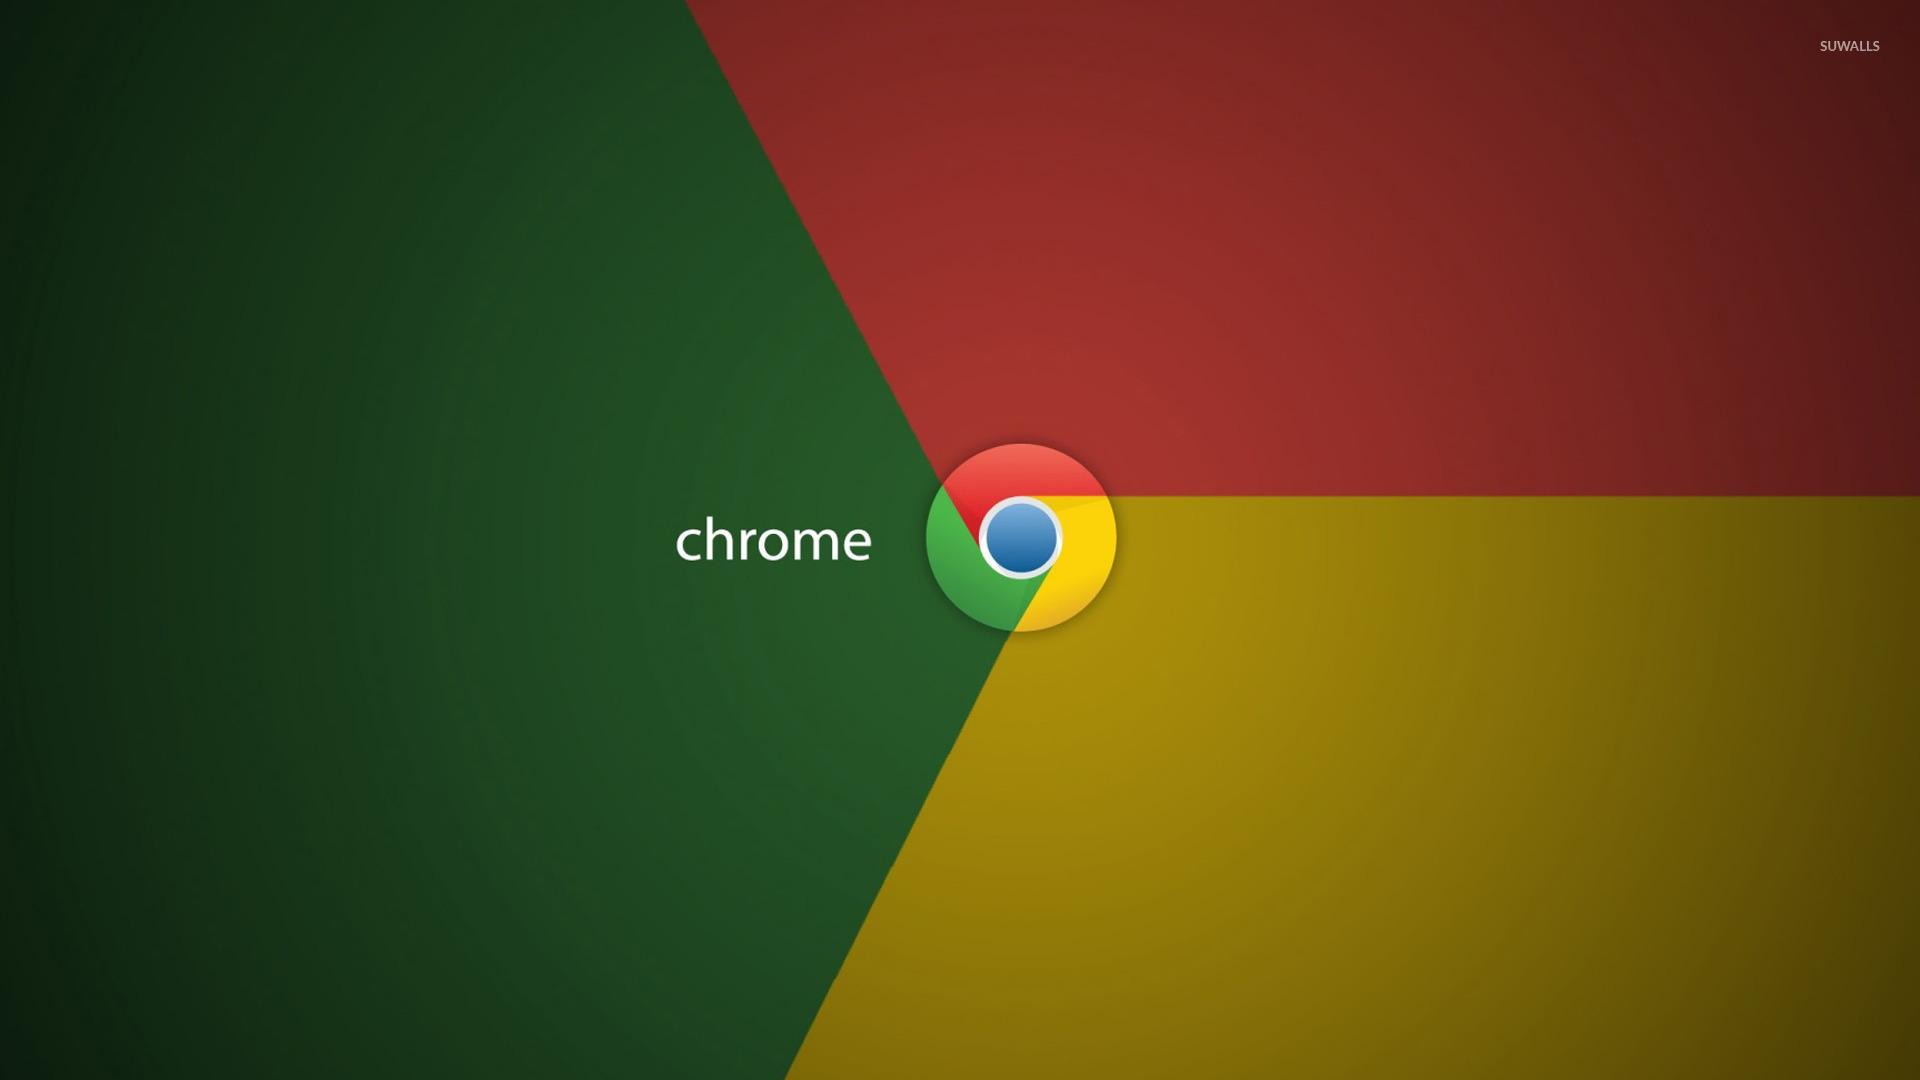 45 Google Chrome Wallpaper 1920x1080 On Wallpapersafari